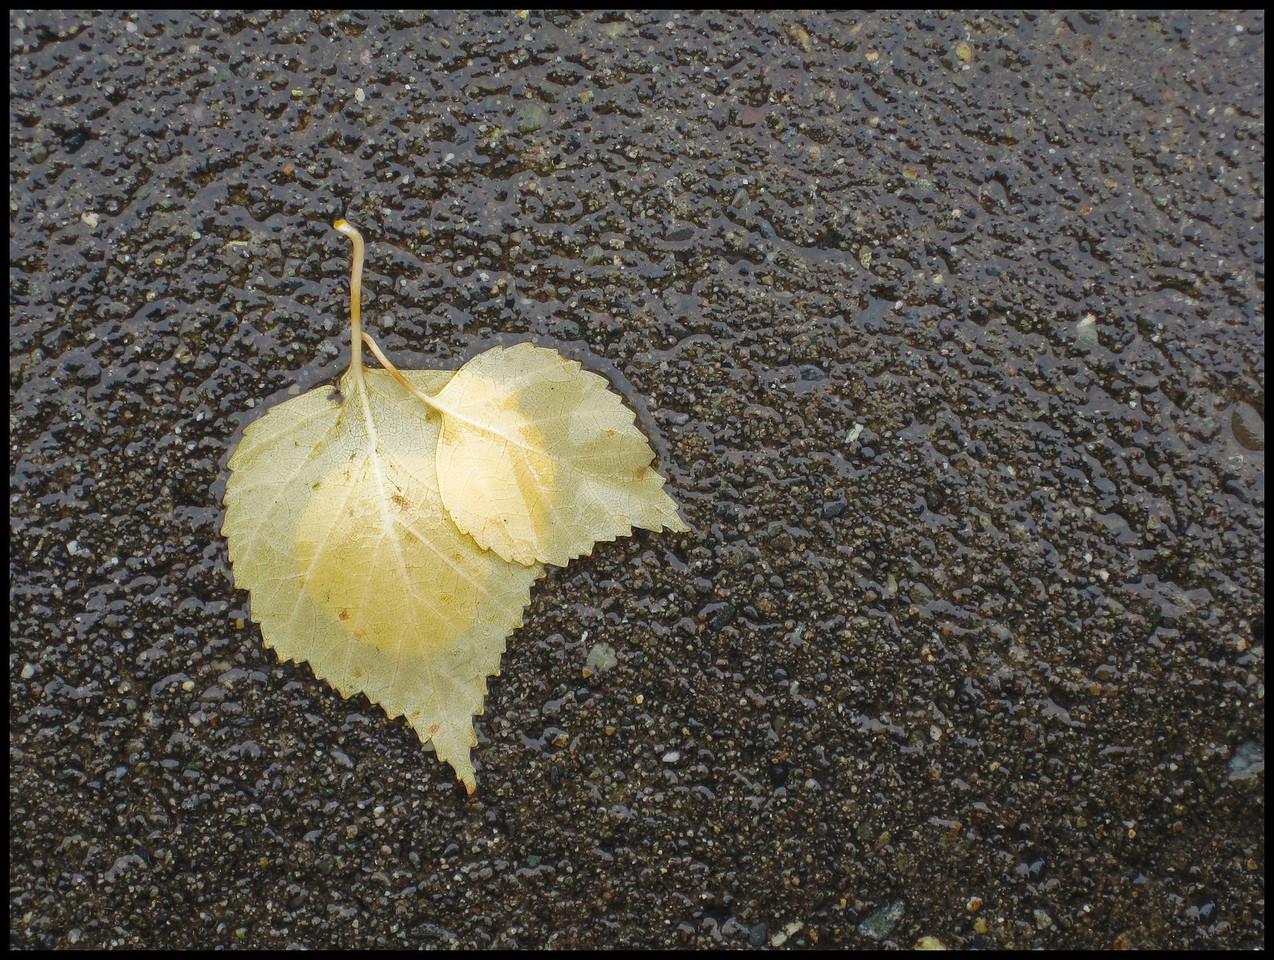 Fall Leaf on Pavement